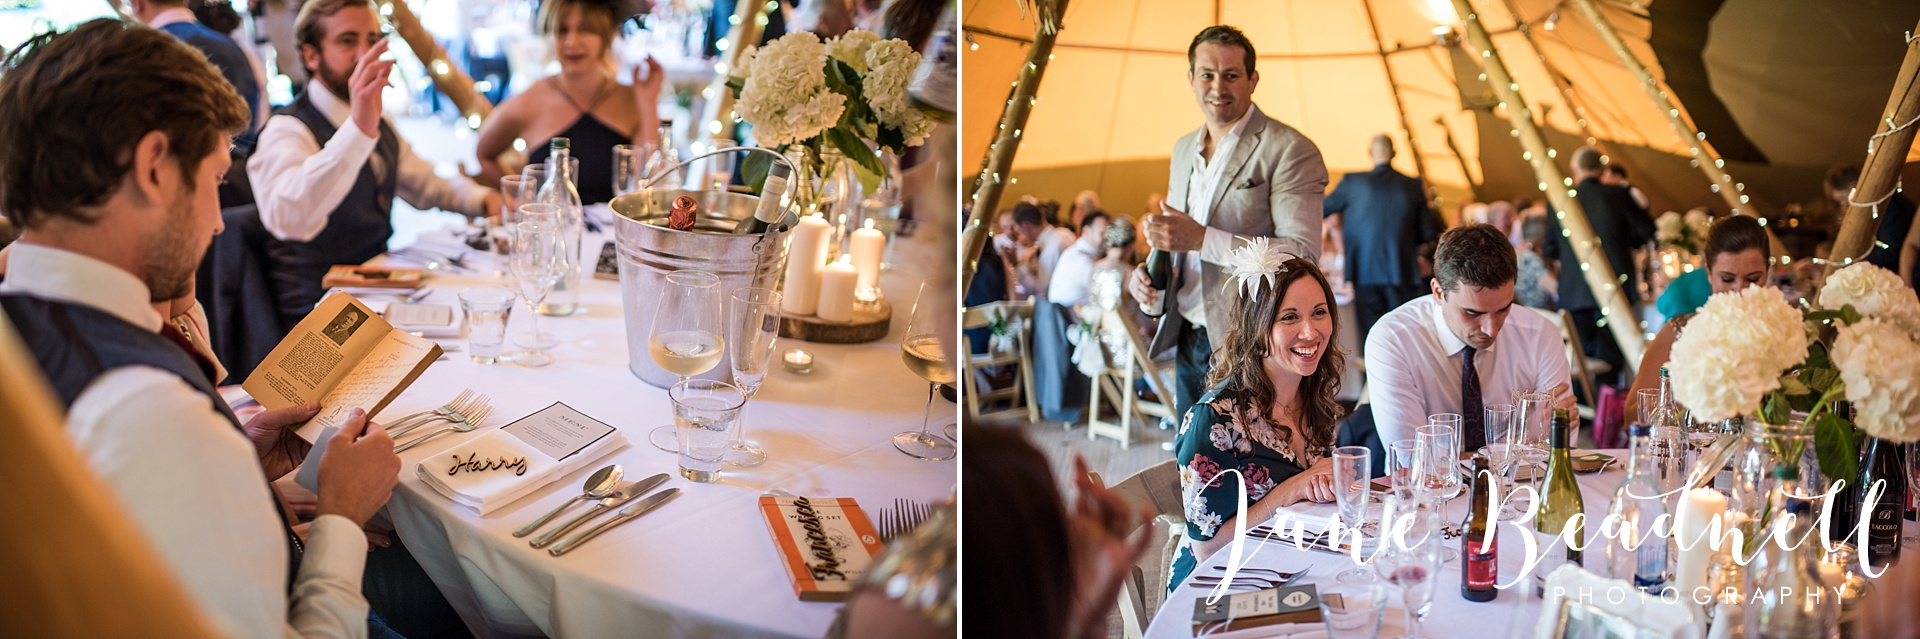 fine-art-wedding-photographer-jane-beadnell-yorkshire-wedding-photographer_0125